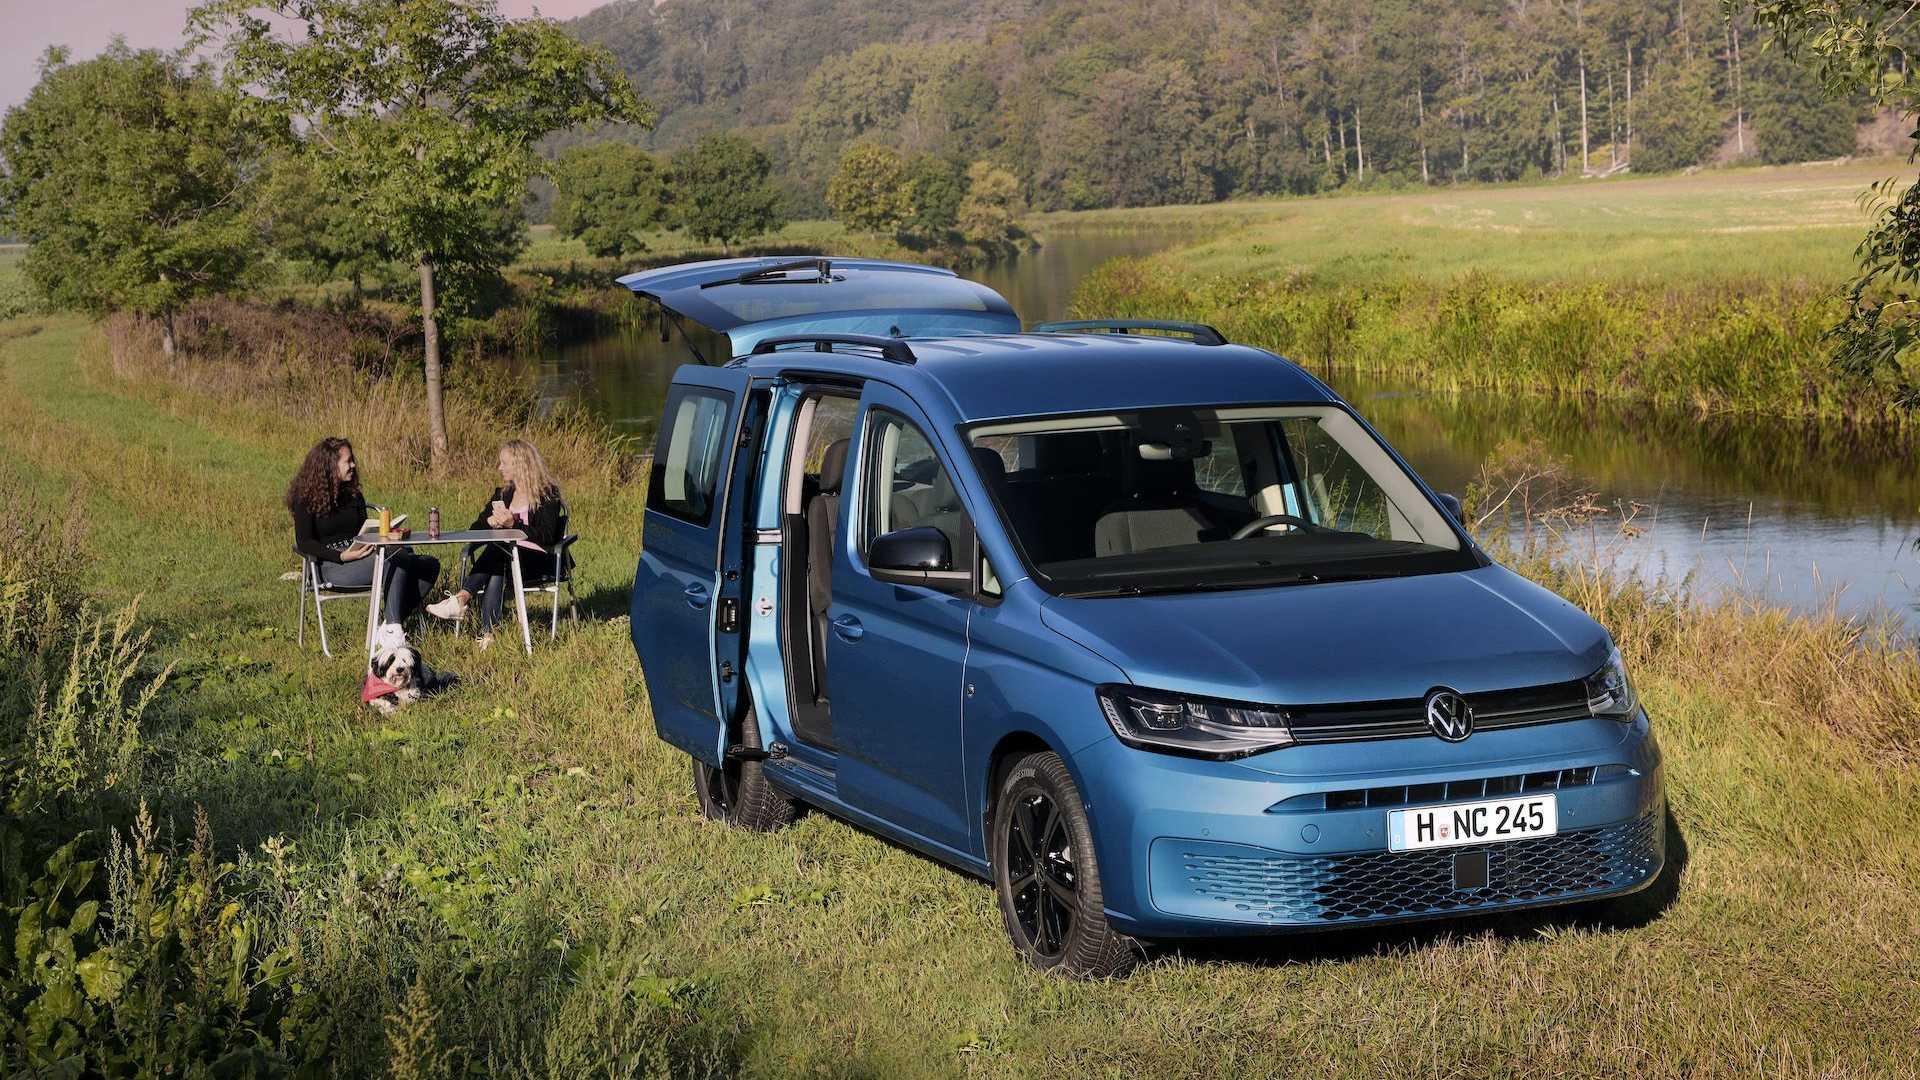 2021 VW Caddy California竟然具備了難以想像的露營機能擴充性   SanjiNoir 黑侍樂讀 